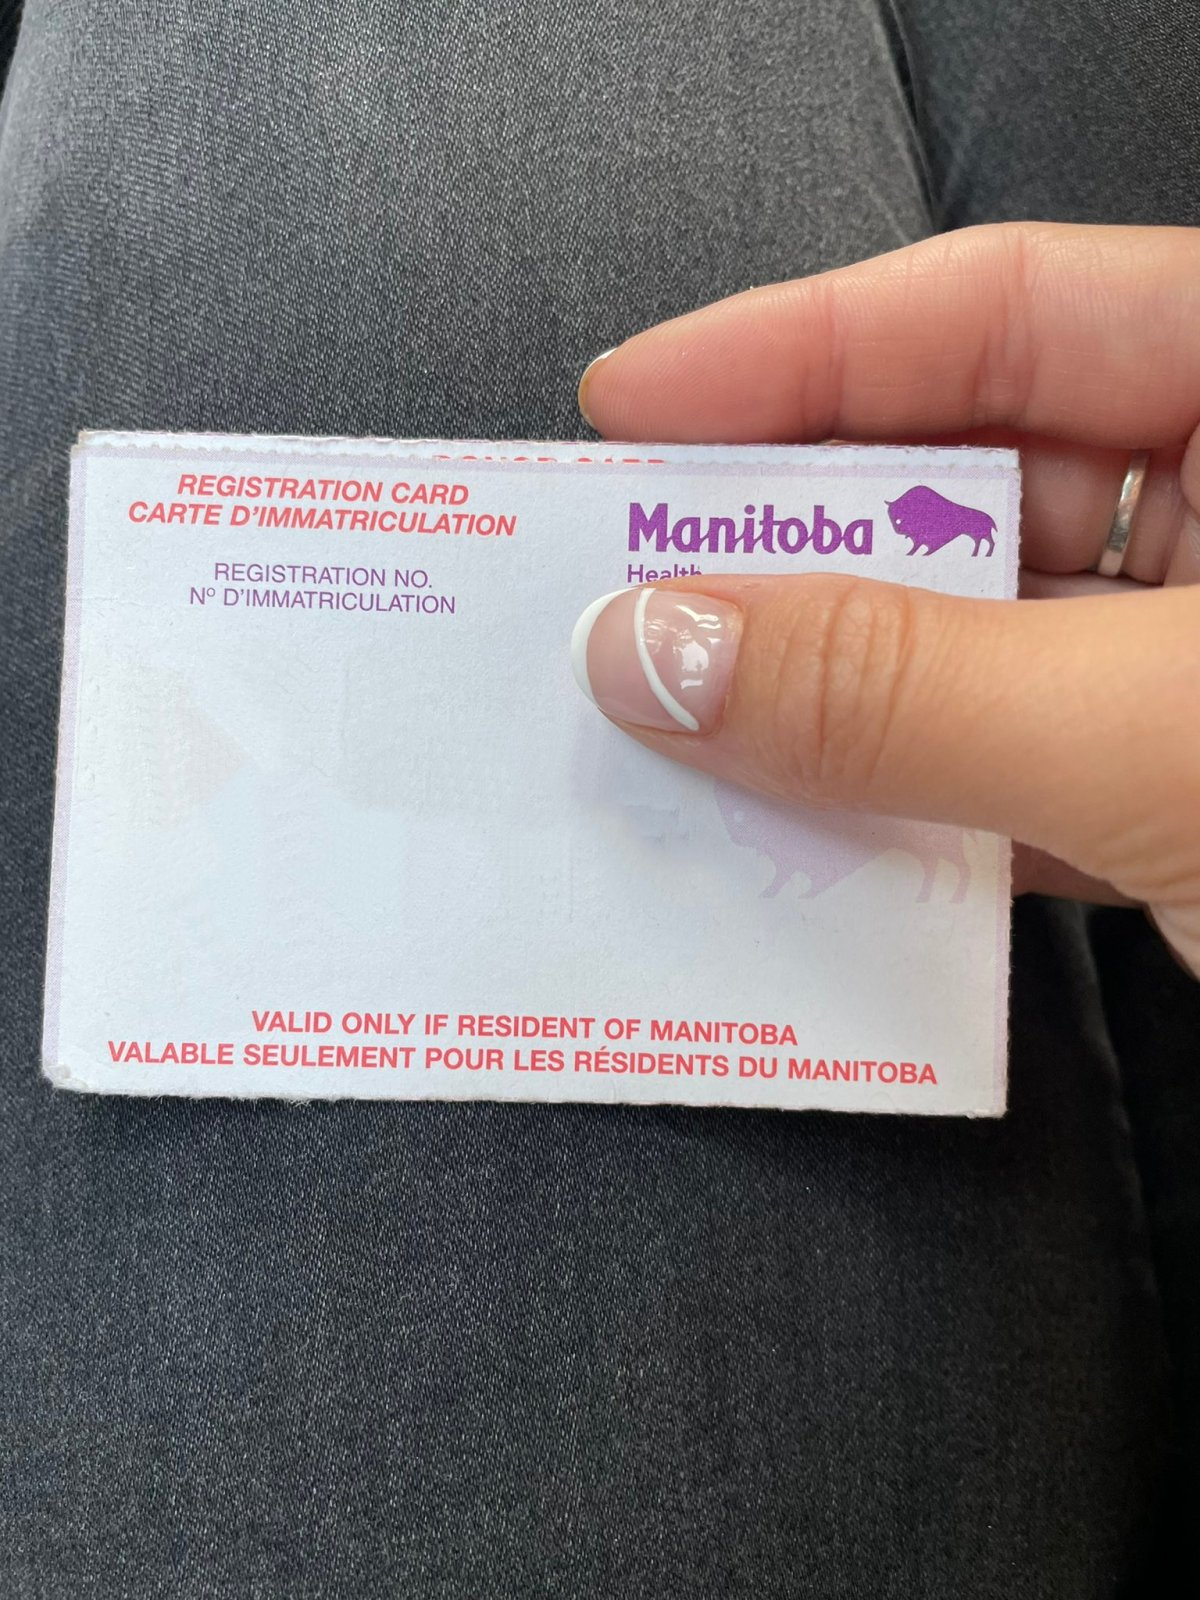 Manitobans facing lengthy health card delays - image